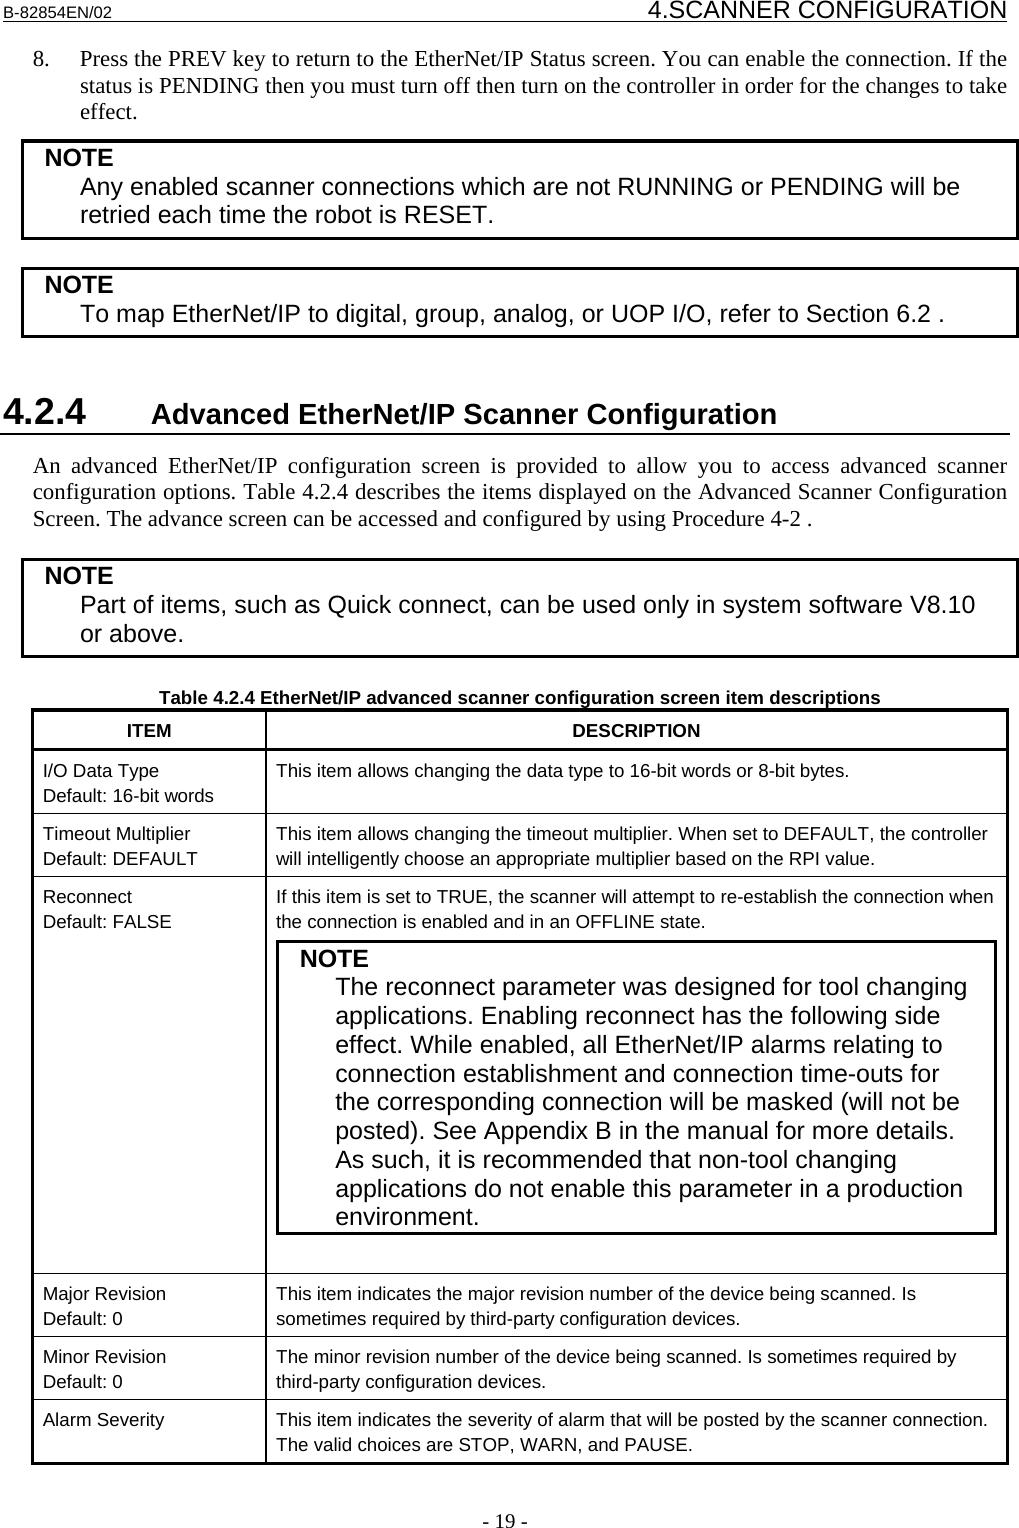 FANUC Robot Series R 30iA/R 30iA Mate/R 30iB CONTROLLER EtherNet/IP